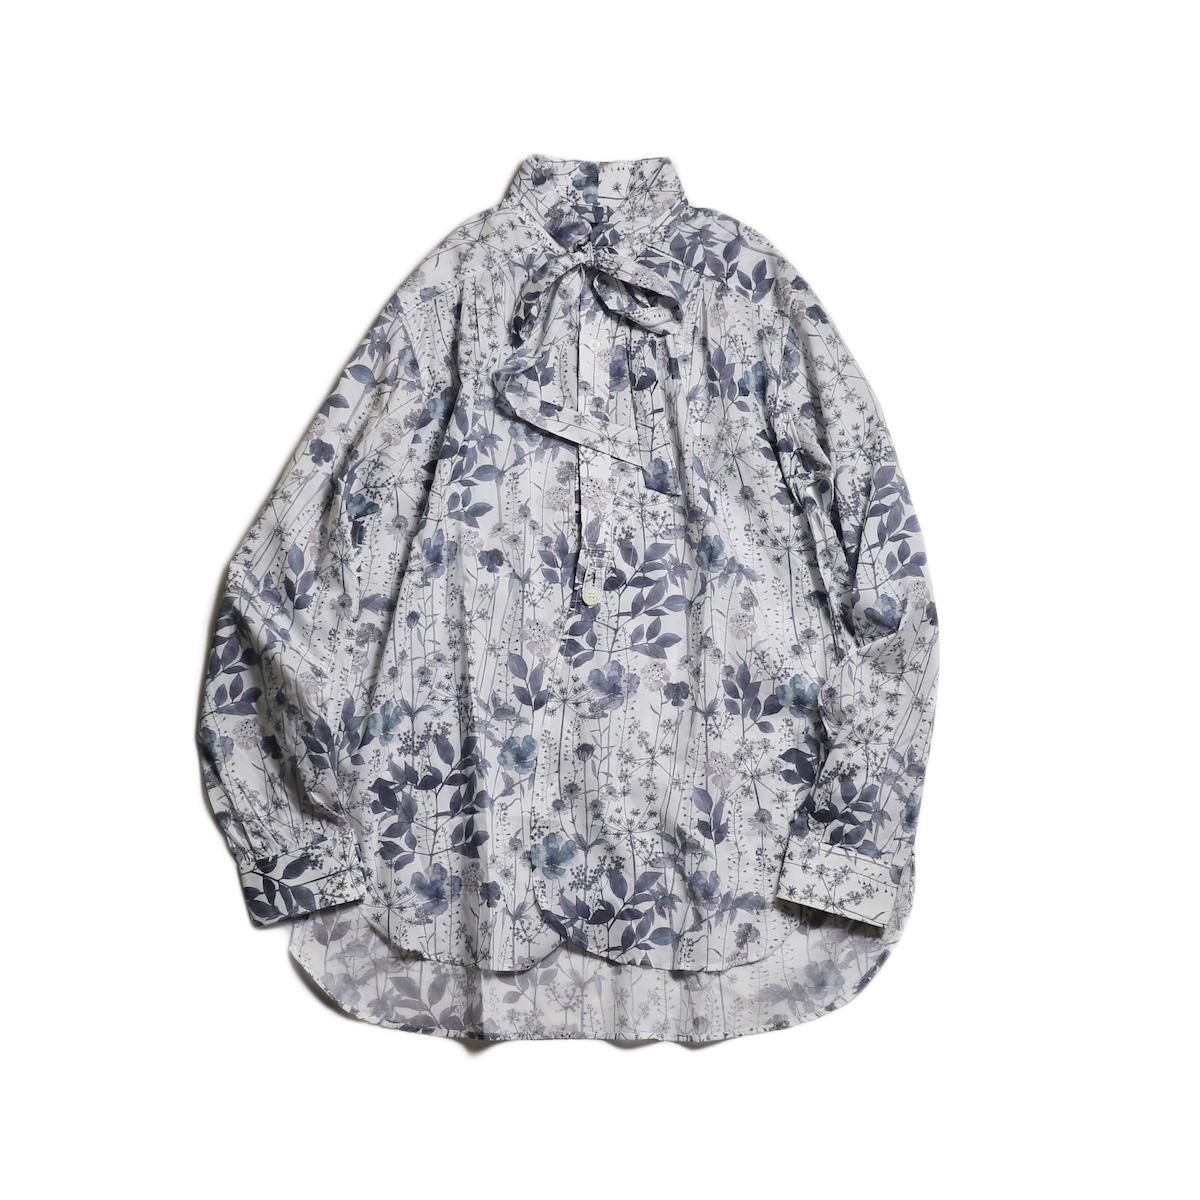 Needles / Ascot Collar EDW Gather Shirt -Liberty Print (Gray Flower)